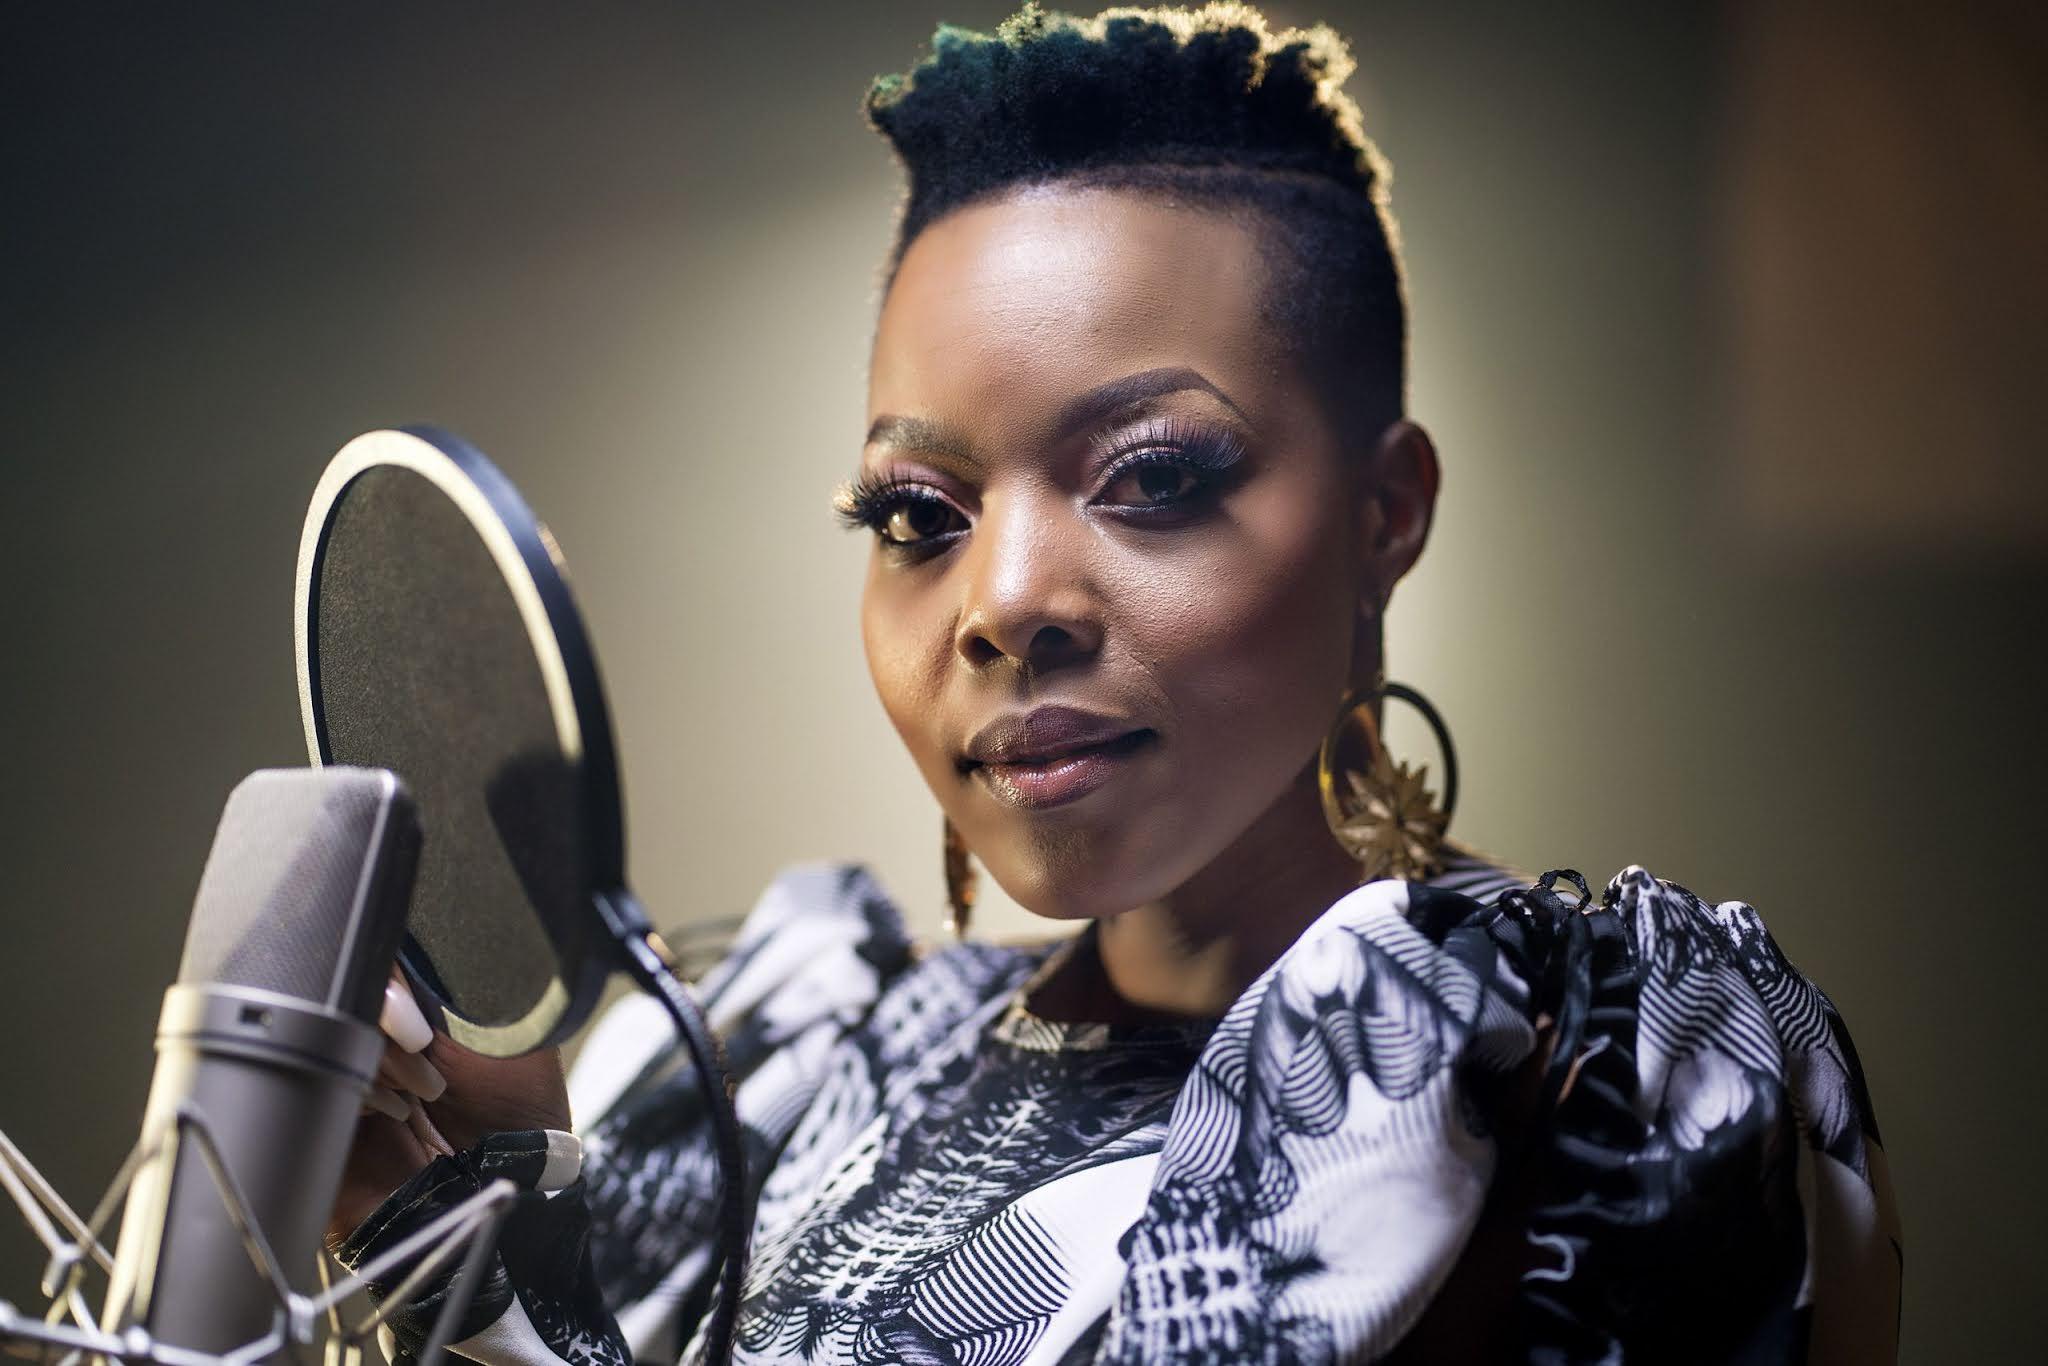 Roki Collaboration with Jerusalema Singer, Nomcebo Zikode On Cards